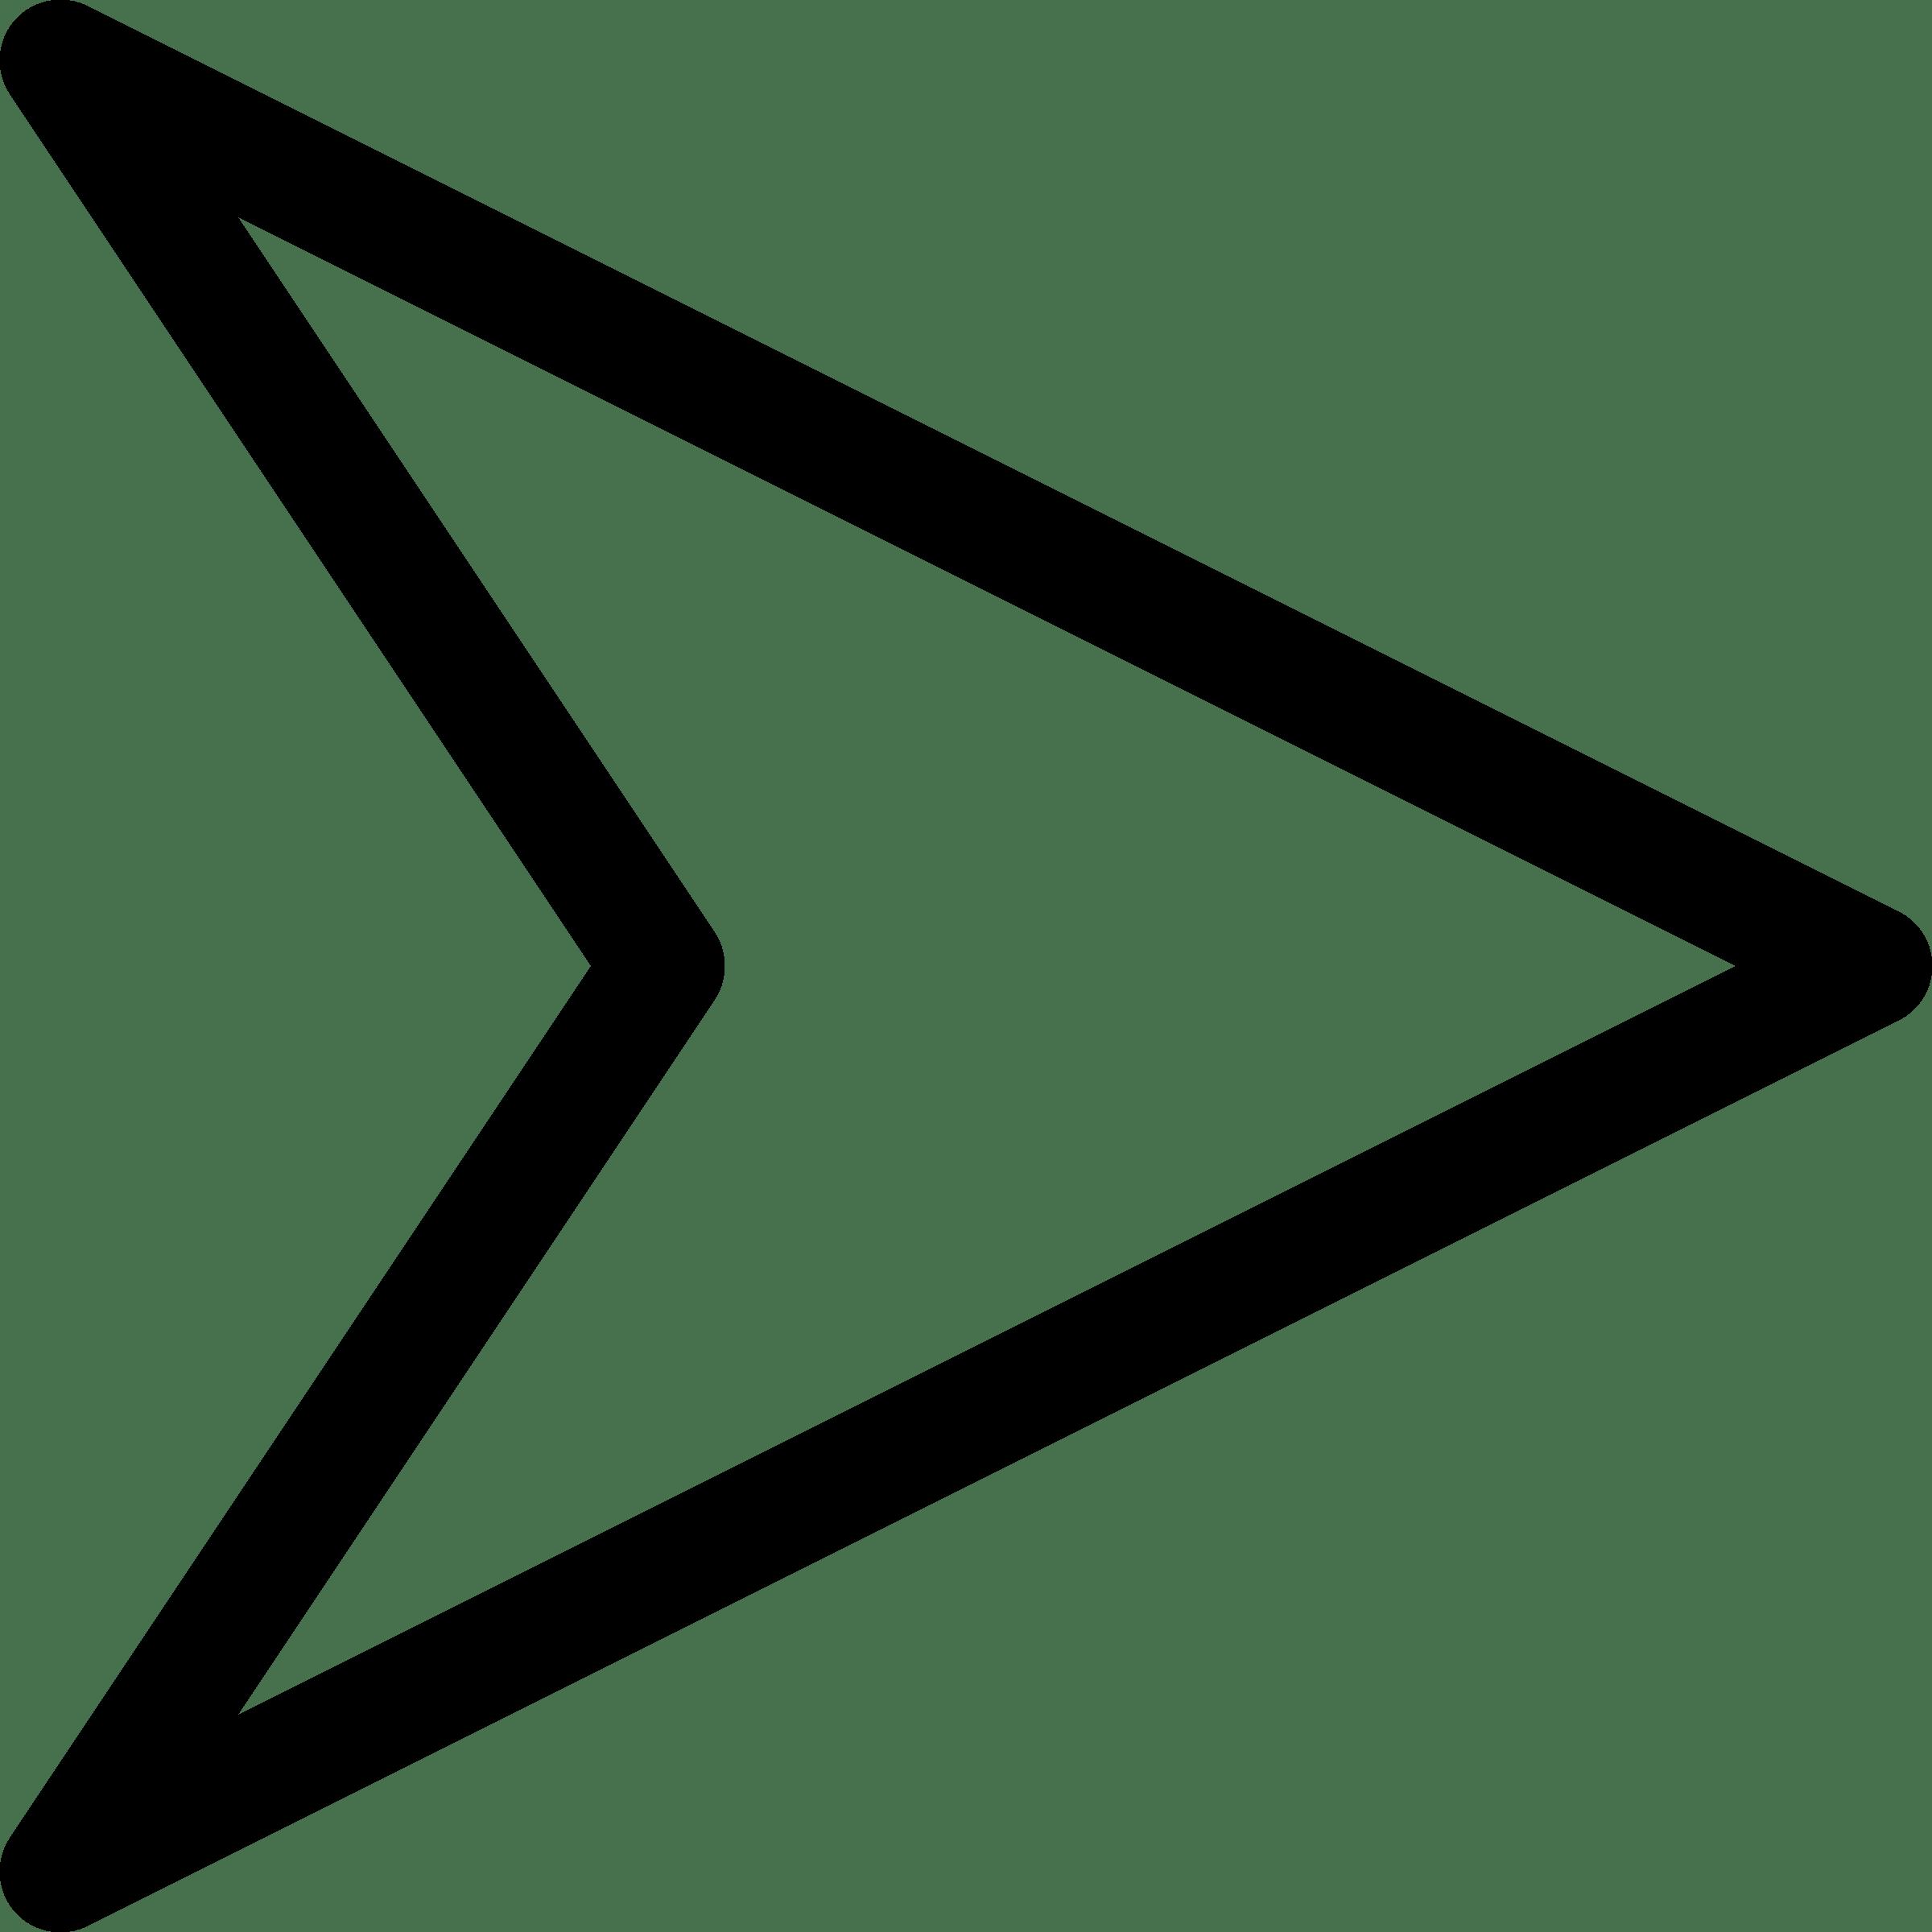 Triangular clipart clear background. Triangle arrow left transparent